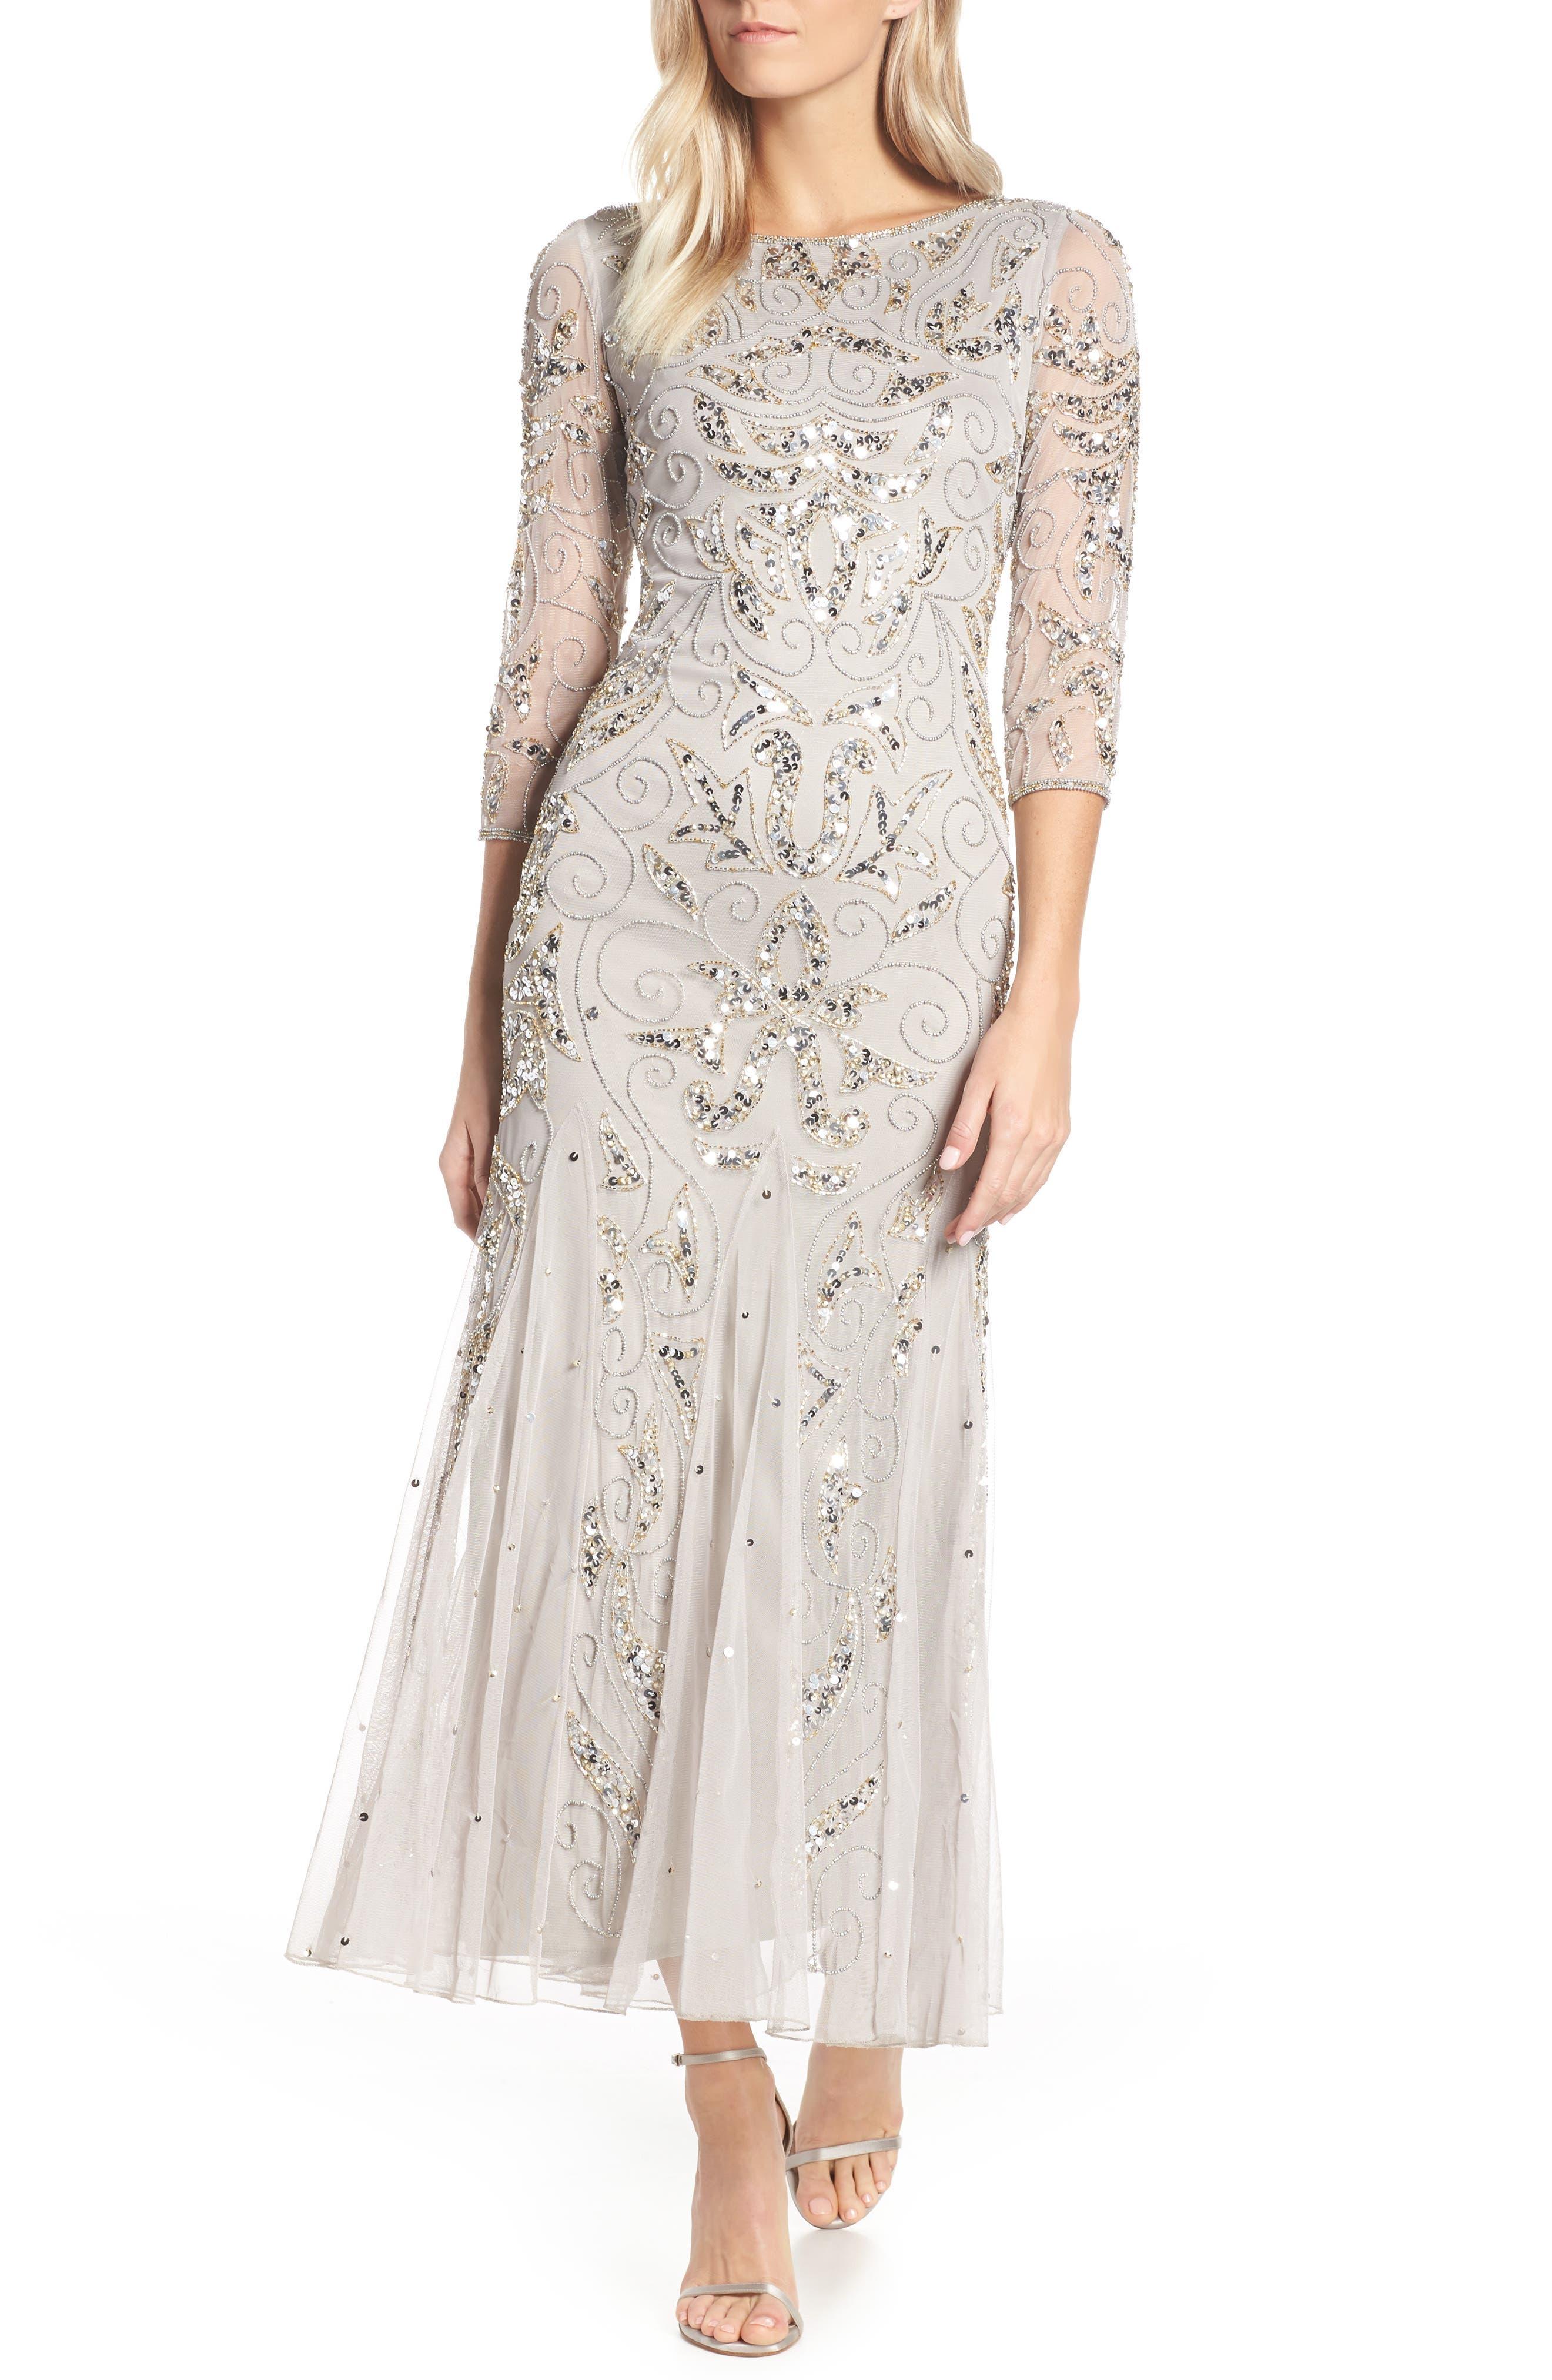 Vintage Inspired Wedding Dress | Vintage Style Wedding Dresses Womens Pisarro Nights Embellished Mesh Gown Size 12 - Metallic $218.00 AT vintagedancer.com